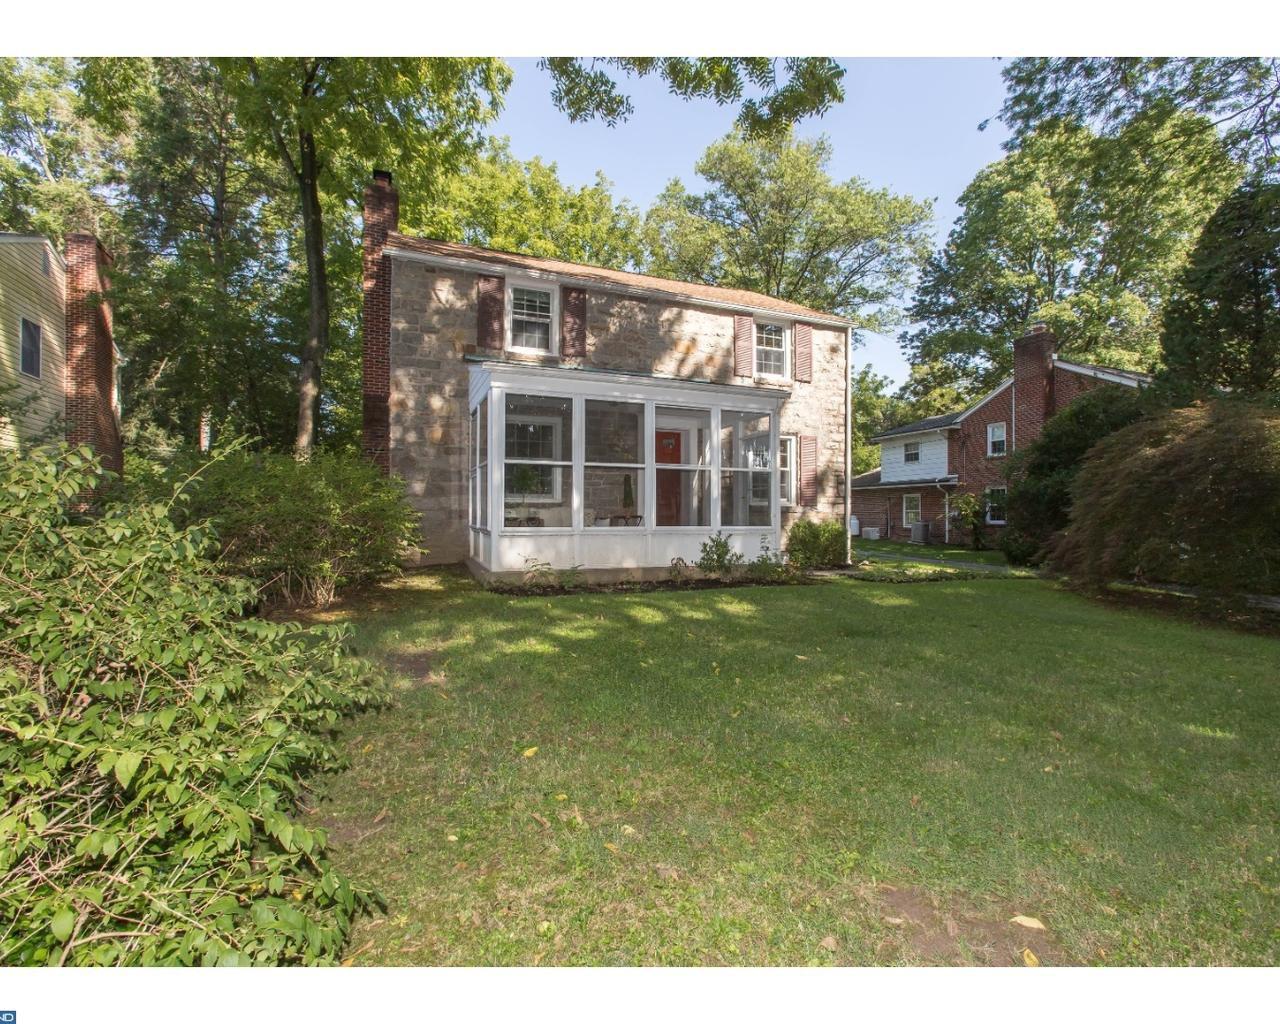 715 Hemlock Rd, Media, PA 19063 - Estimate and Home Details | Trulia